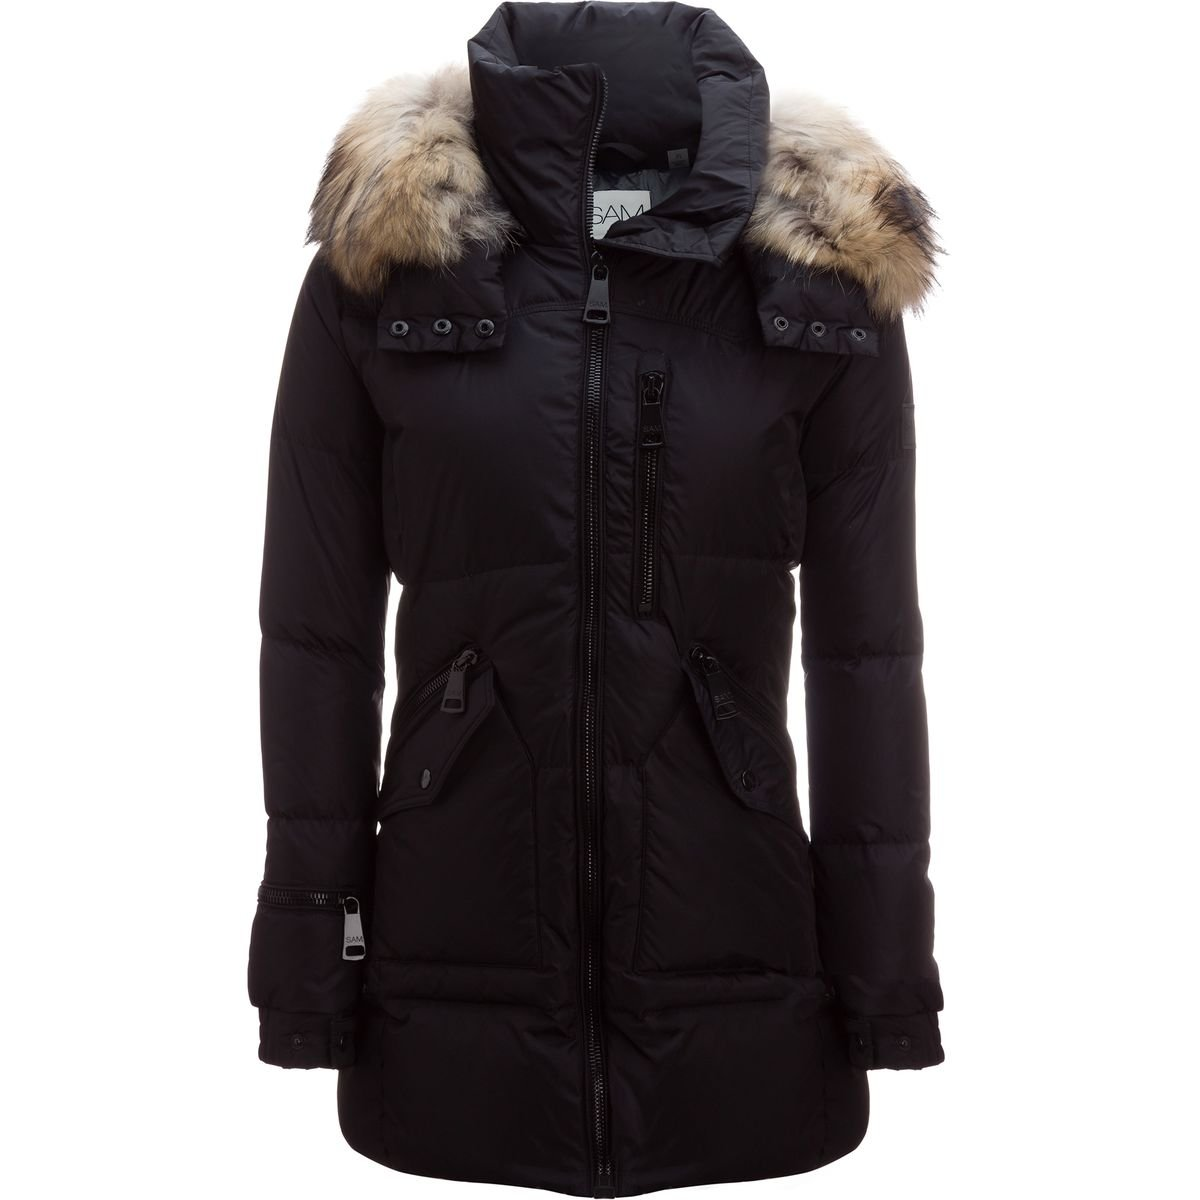 72a70be19 Amazon.com: SAM Fur Cruiser Jacket - Women's Black/Natural, S: Clothing